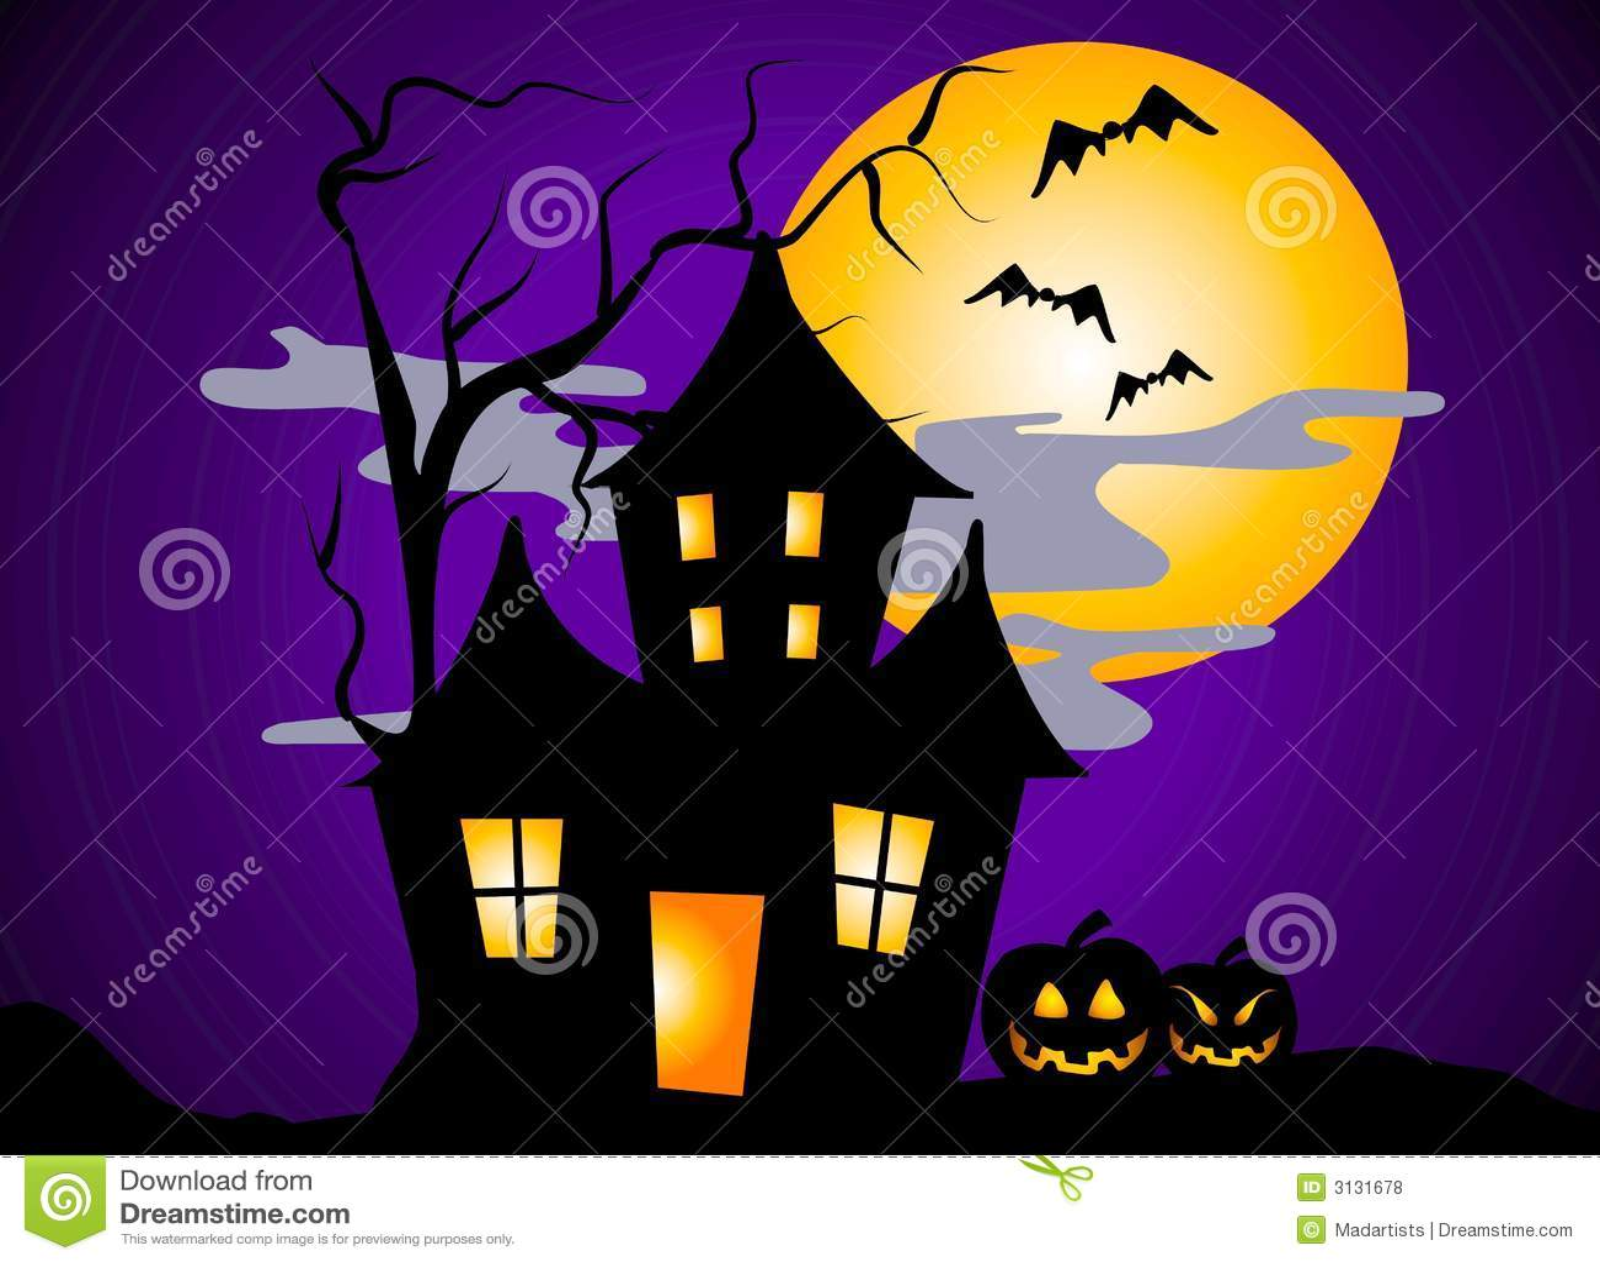 Haunted House Halloween 2